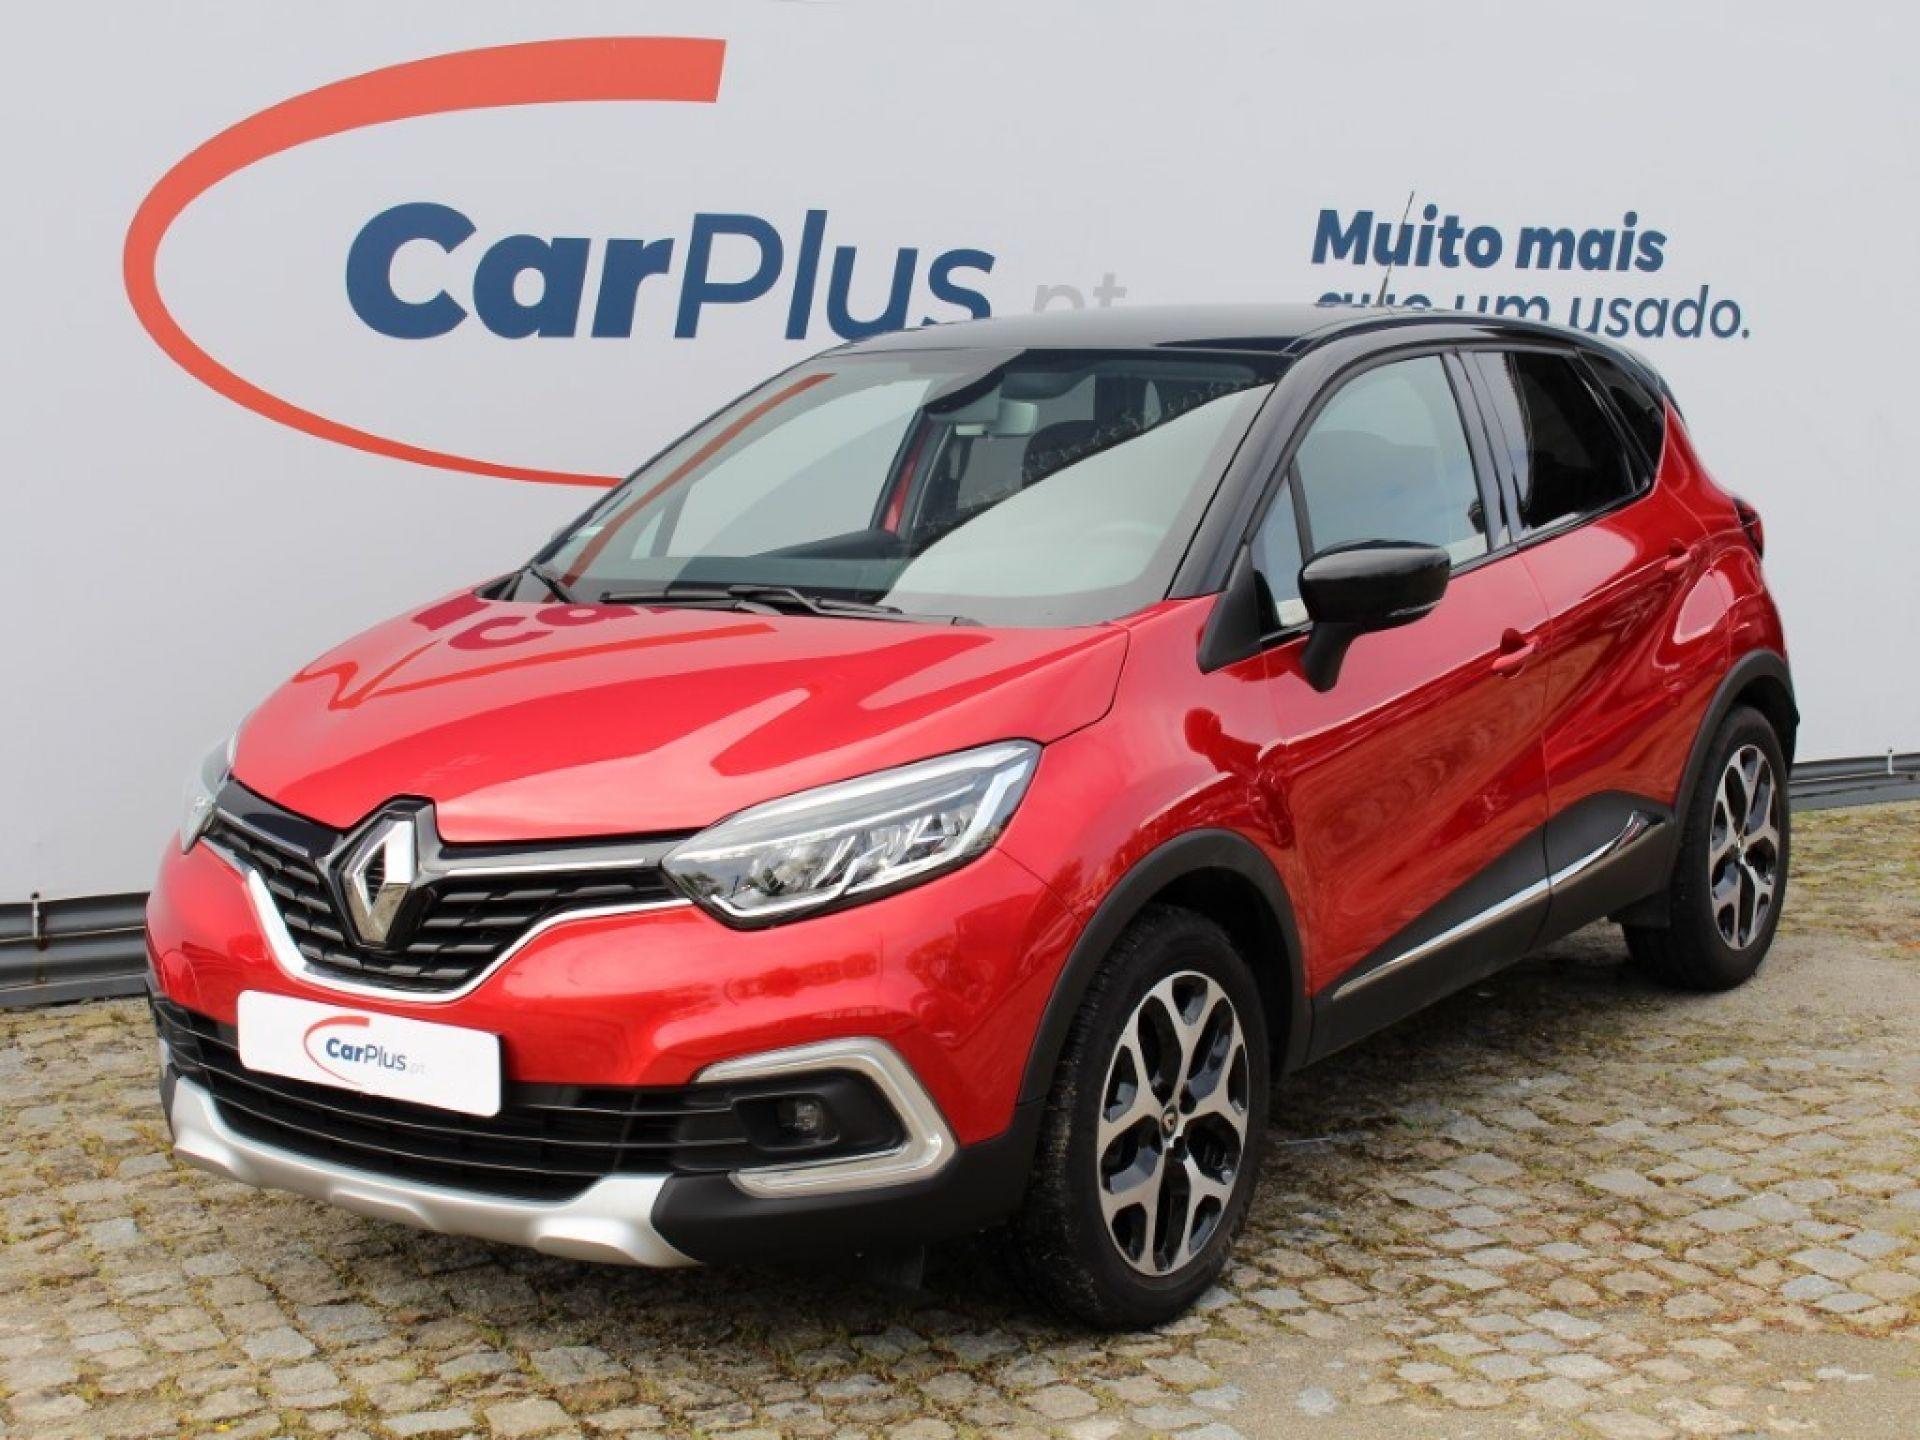 Renault Captur 0.9 TCe 90 Exclusive segunda mão Porto